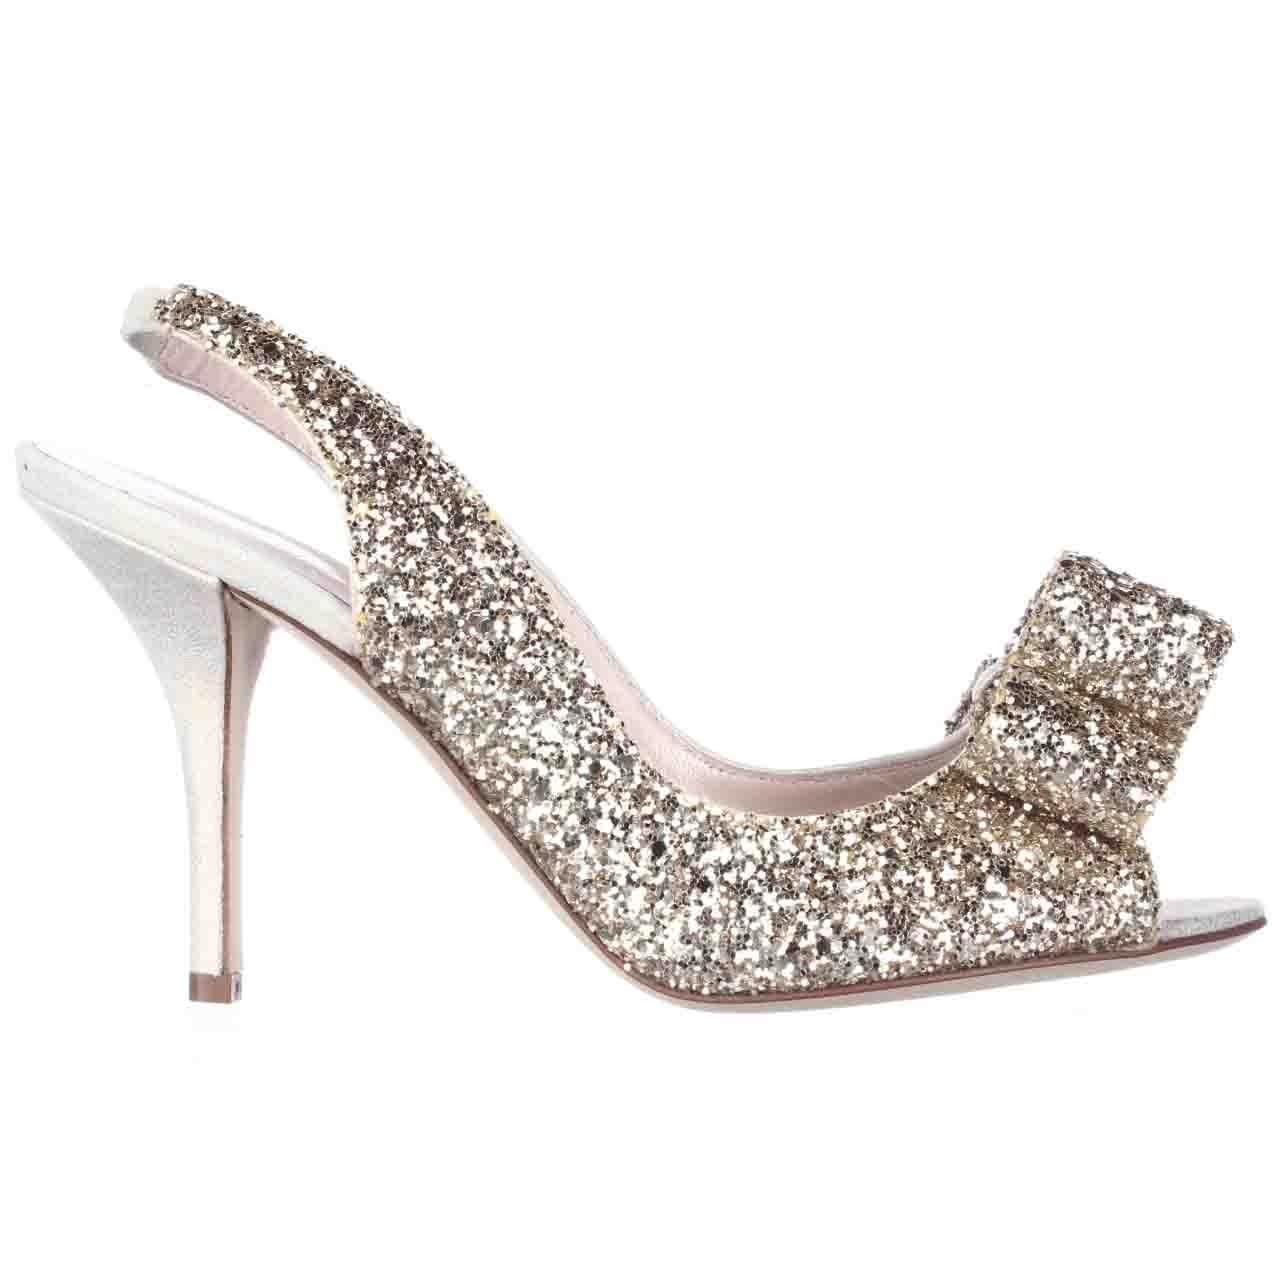 kate spade new york charm heel in metallic lyst